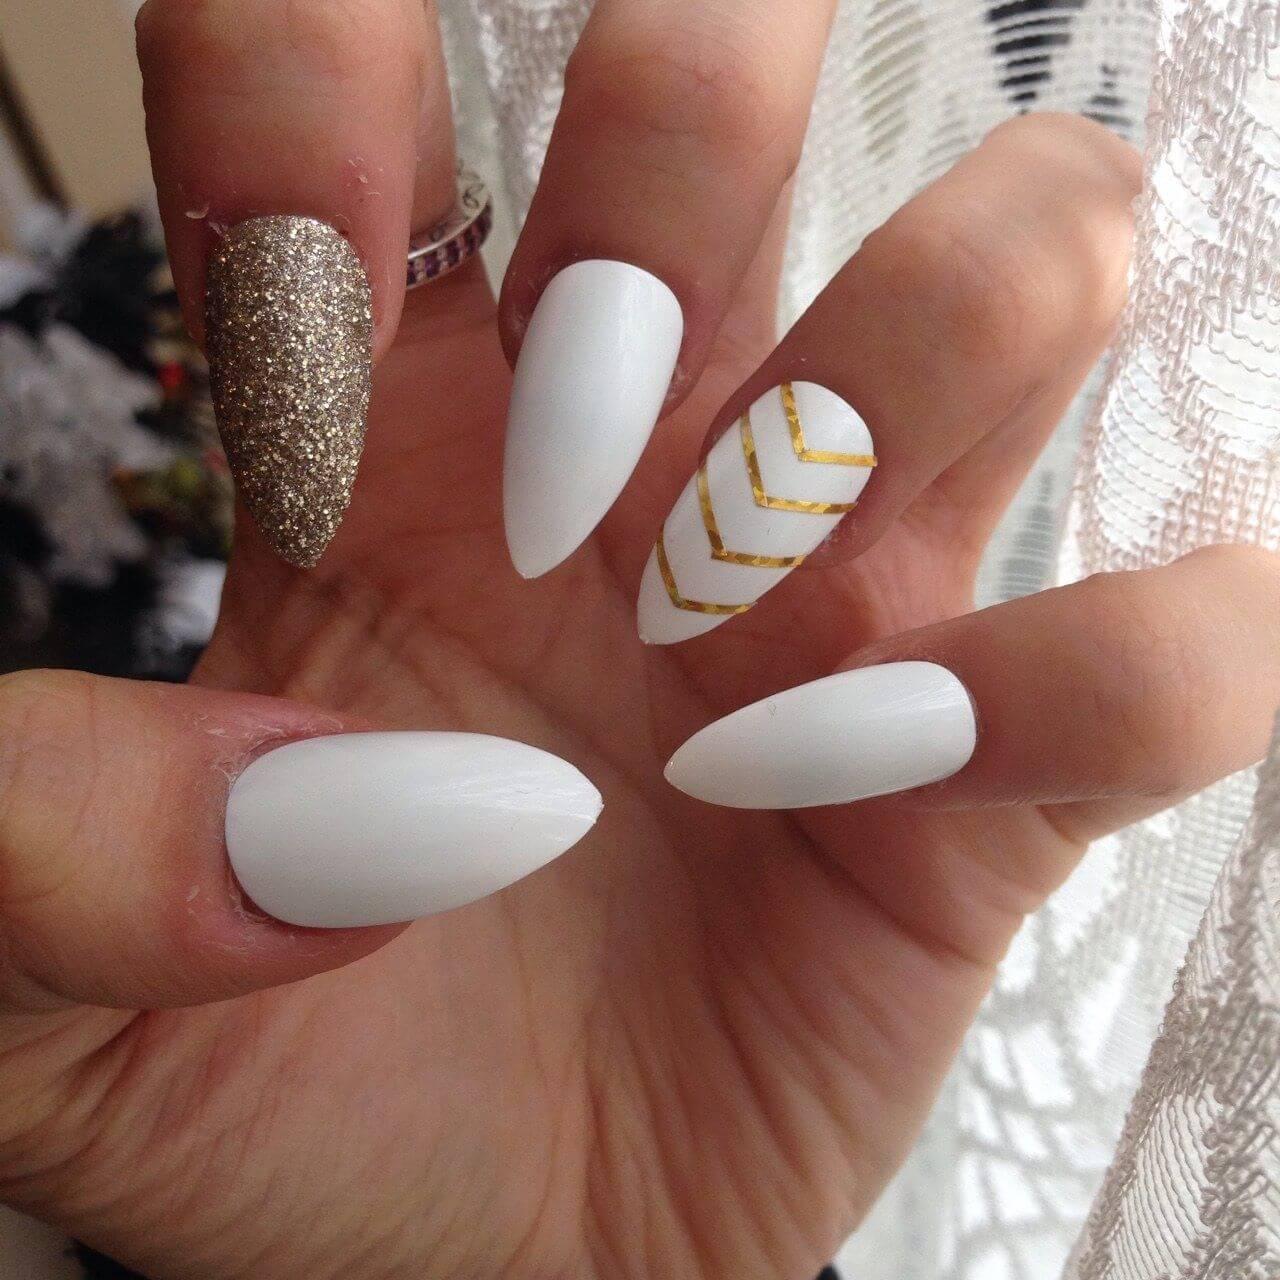 ongles blancs simples avec rubans dorés